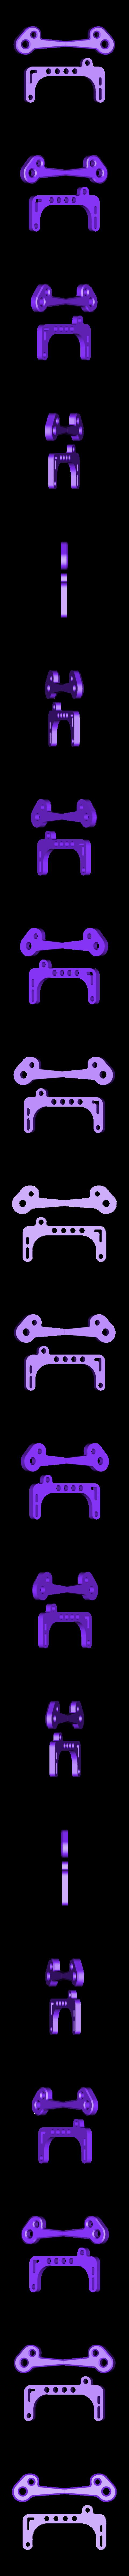 Top Part and Foot.stl Download 3DS file RETRO CAMERA FLOWERPOT • 3D printer template, tolgaaxu